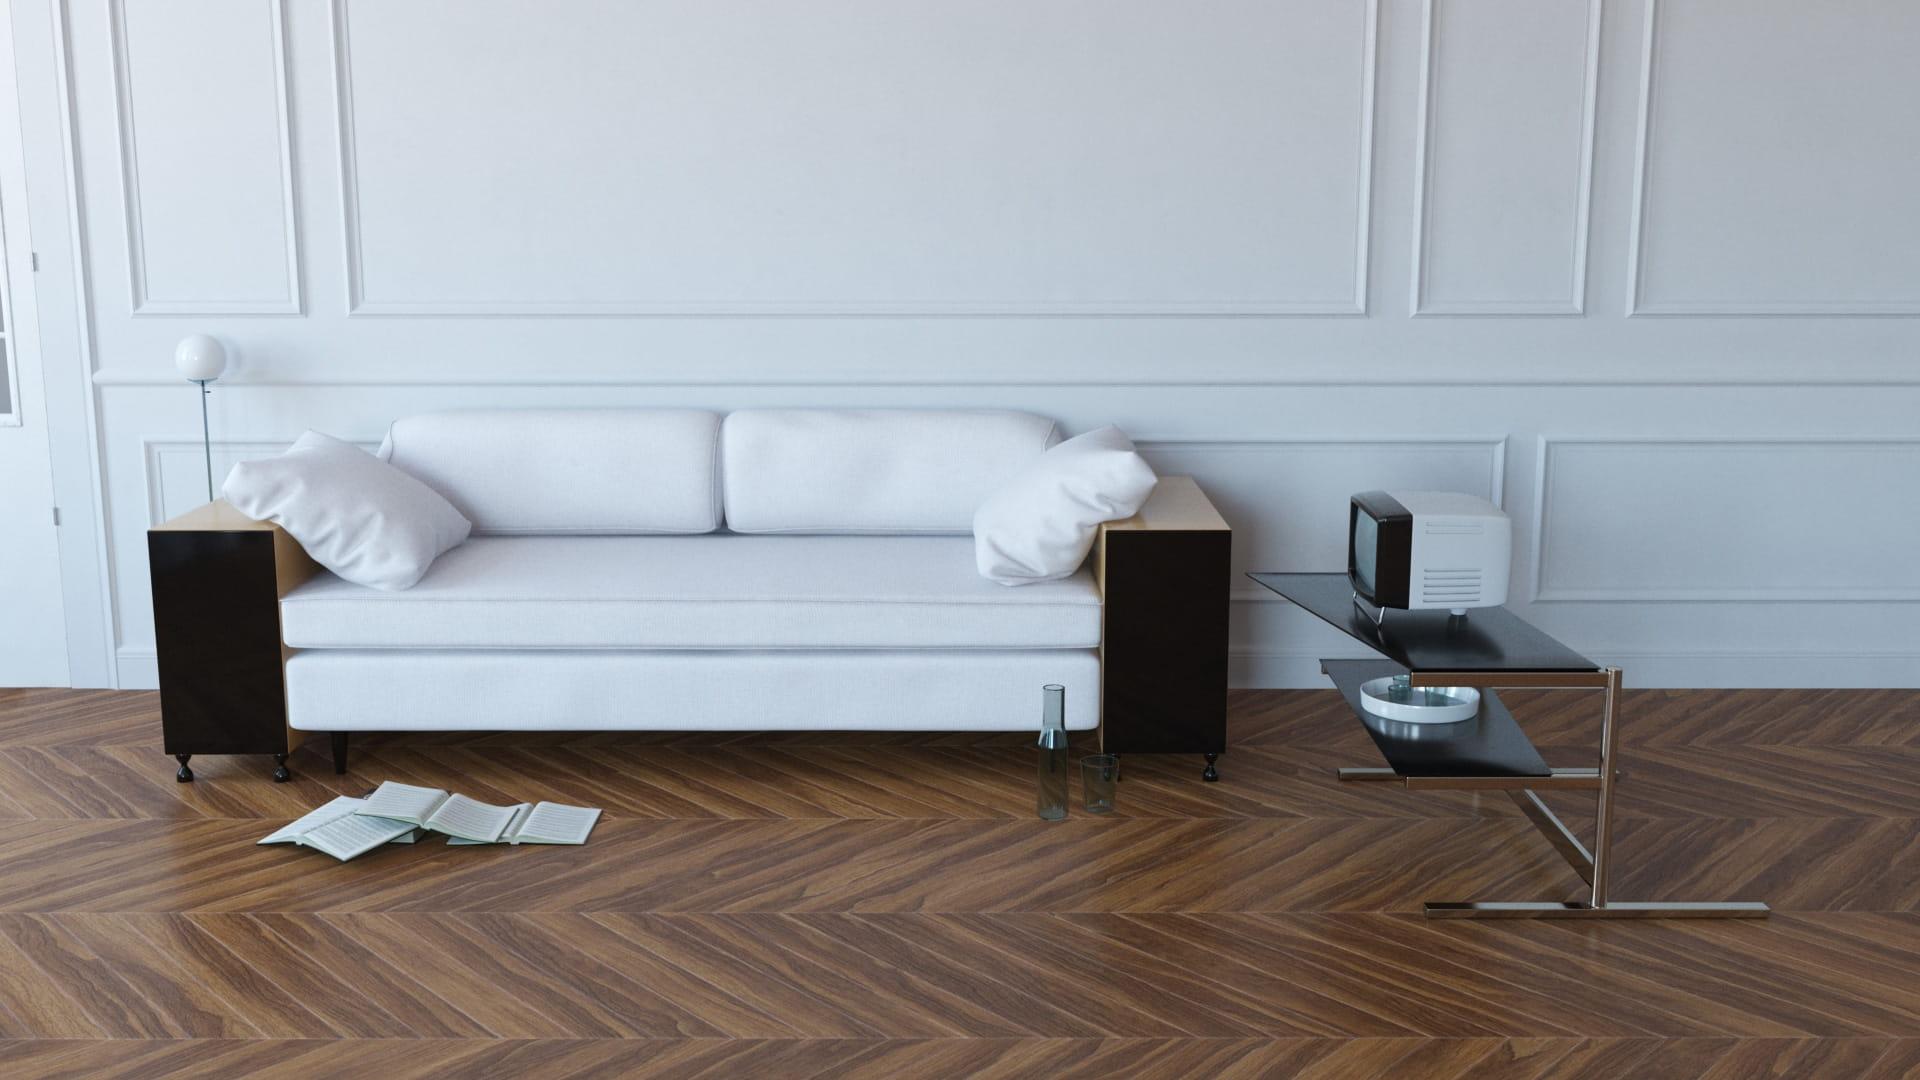 furniture set 6 AM253